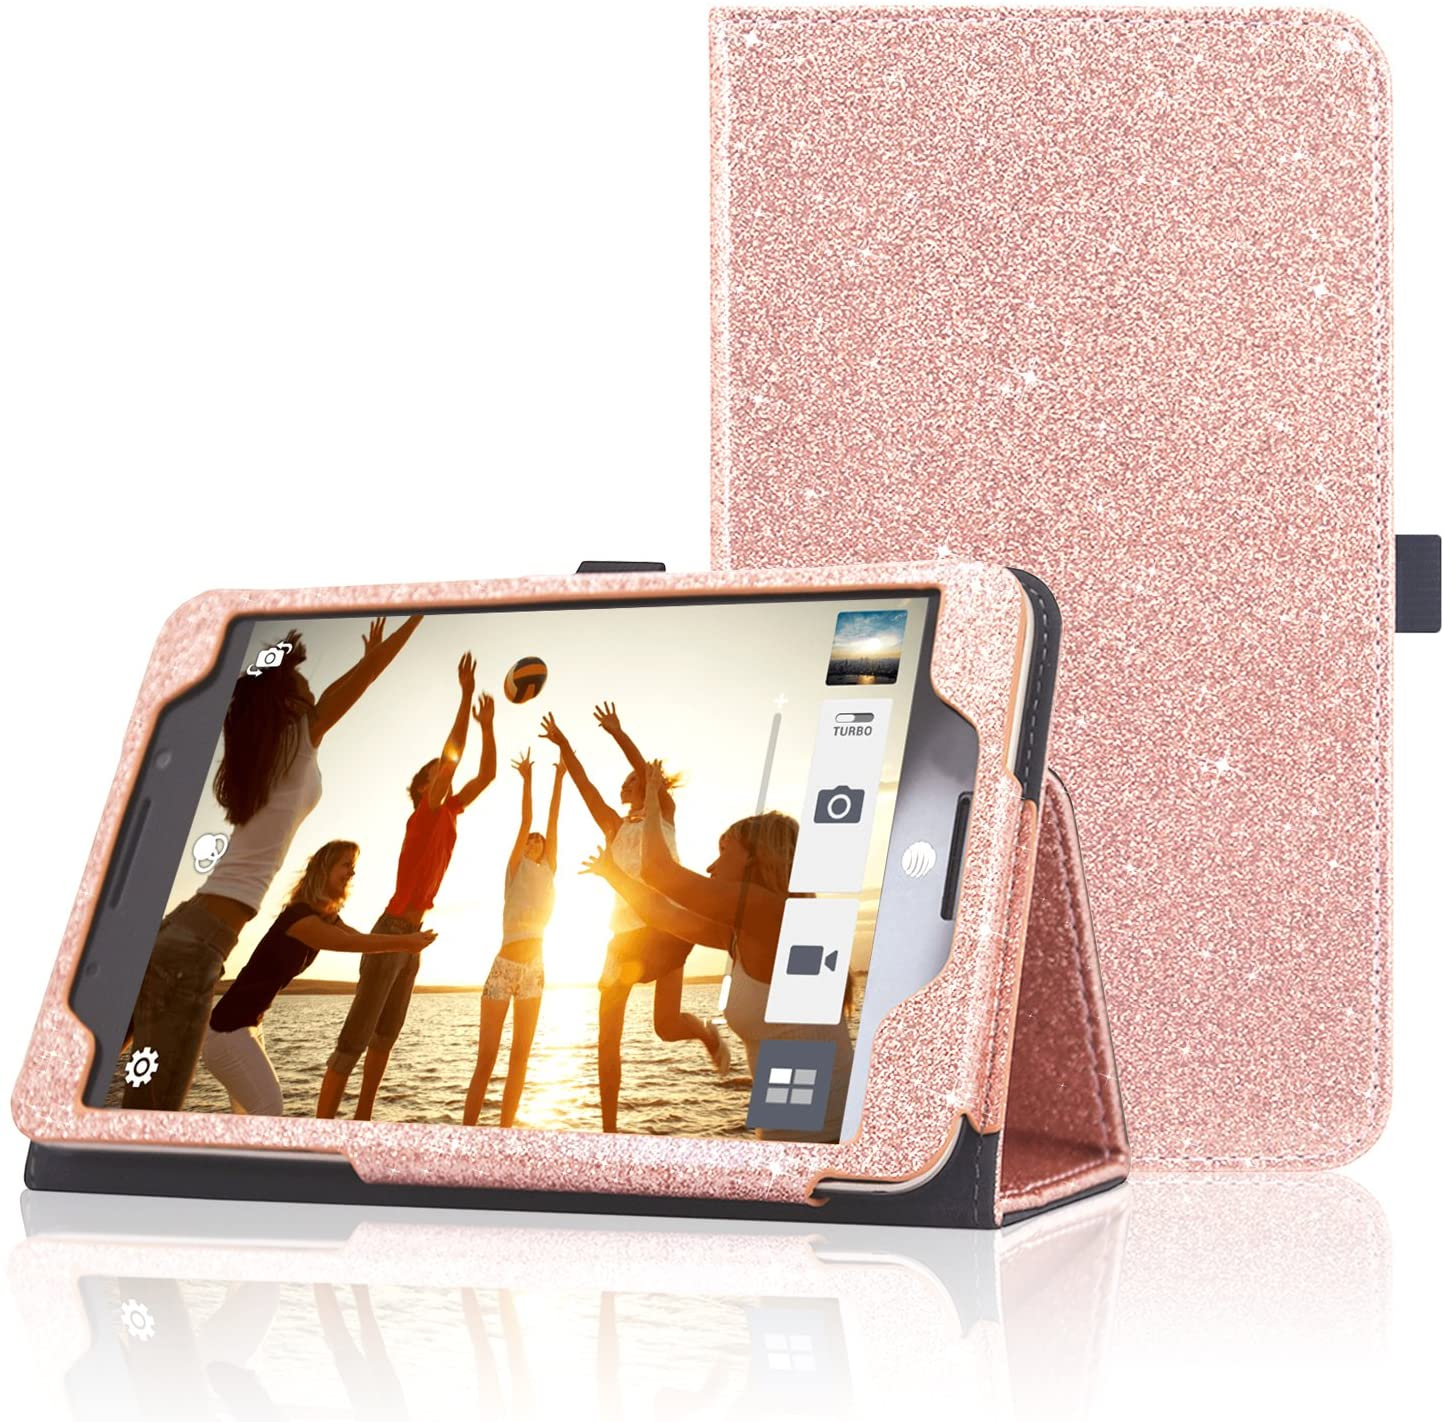 ACdream ASUS MeMO Pad 7 LTE Case, Premium PU Leather Smart Cover Case for AT&T ASUS MeMo Pad 7 LTE GoPhone Prepaid Tablet ME375CL, Rose Gold Star of Paris